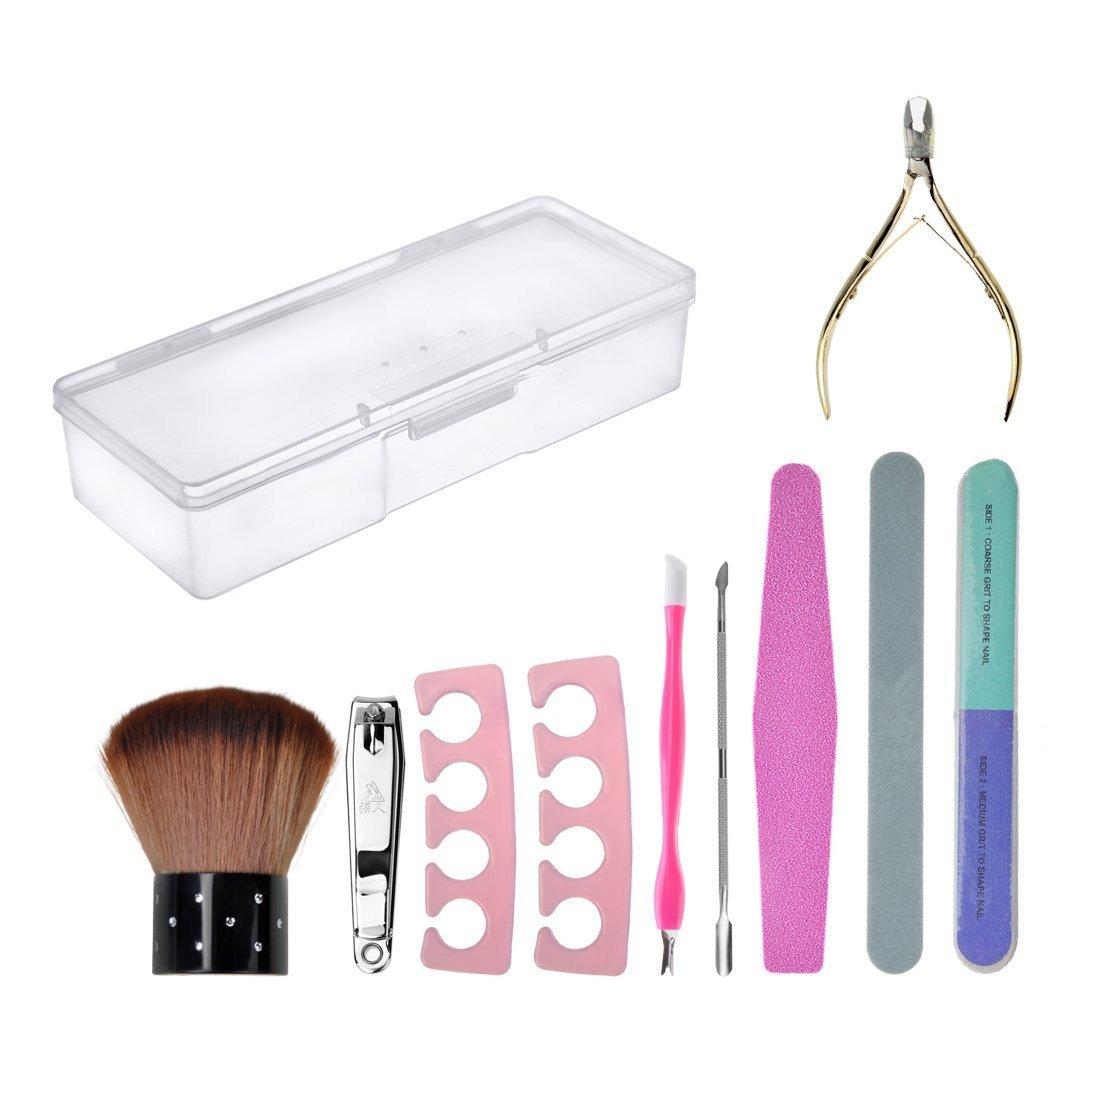 Biutee model nail art tool set Maniküre Pediküre Set mit nail buffer, Nail-Cutter, Metall Spatel, Nagelhautschieber, und nail zange set + Aufbewahrungs box TOOL-AT-746-MG